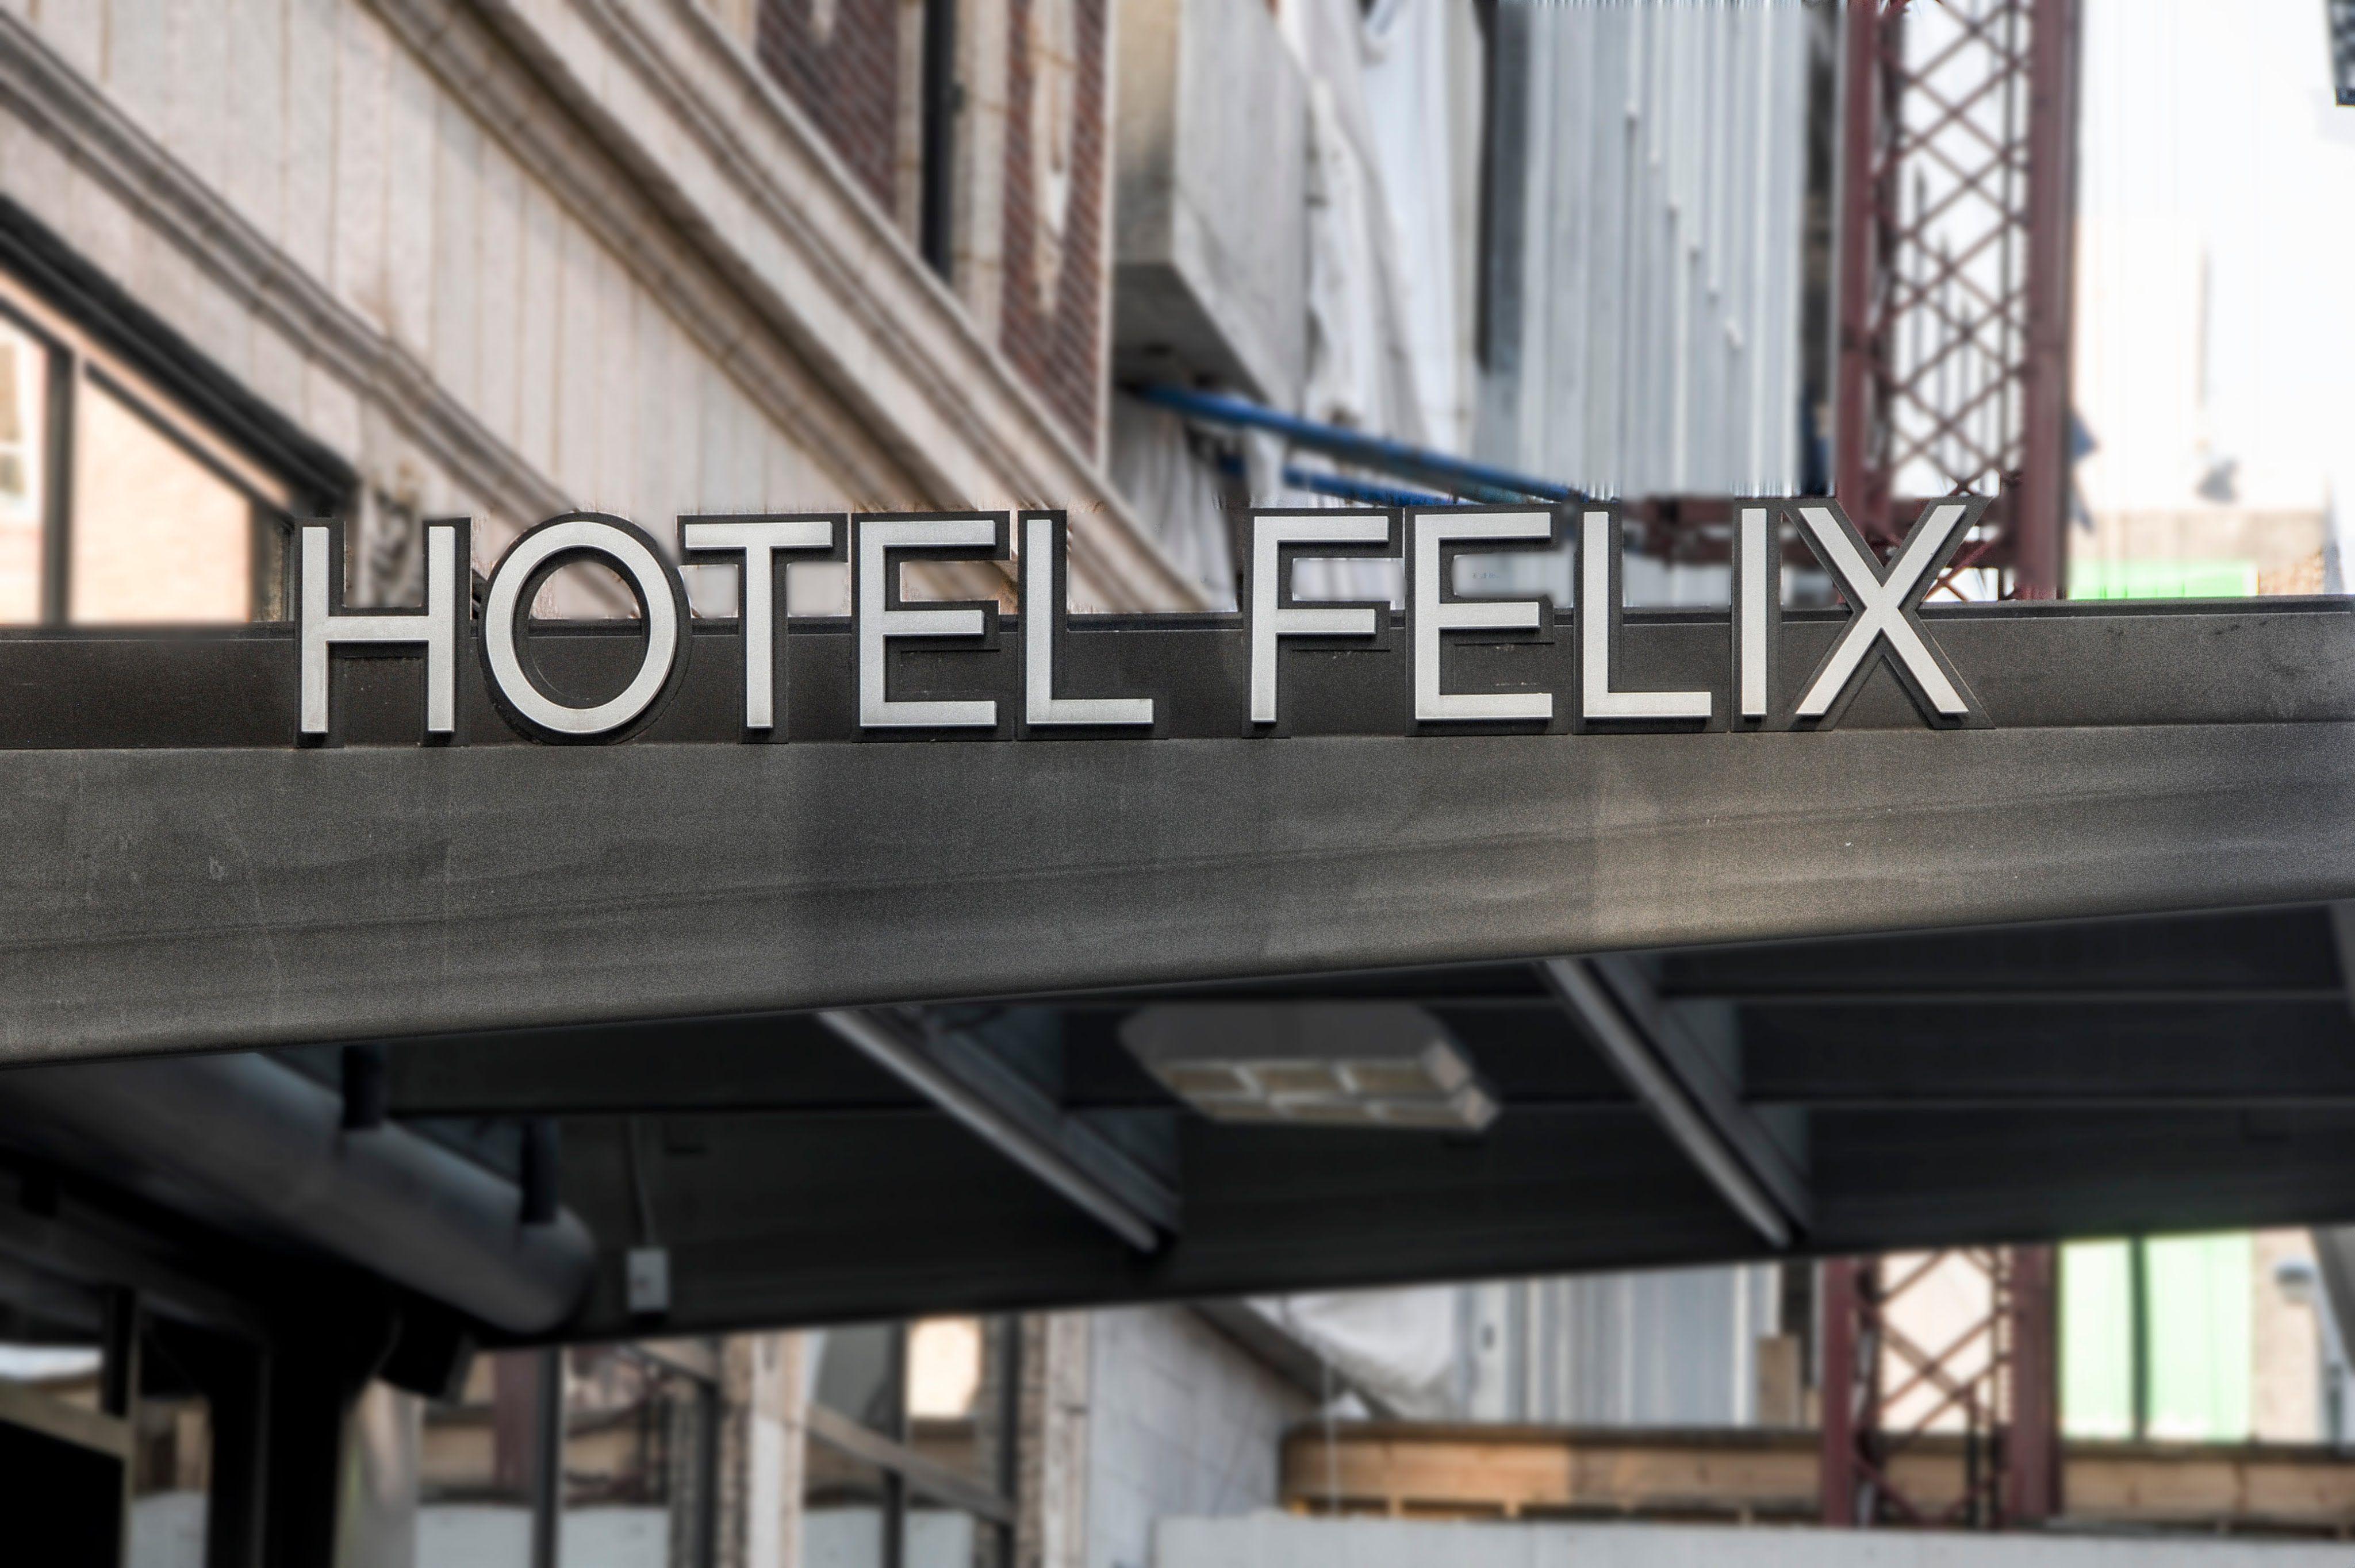 Hotel Felix Chicago Usa Hotel Felix Chicago Hotel Chicago